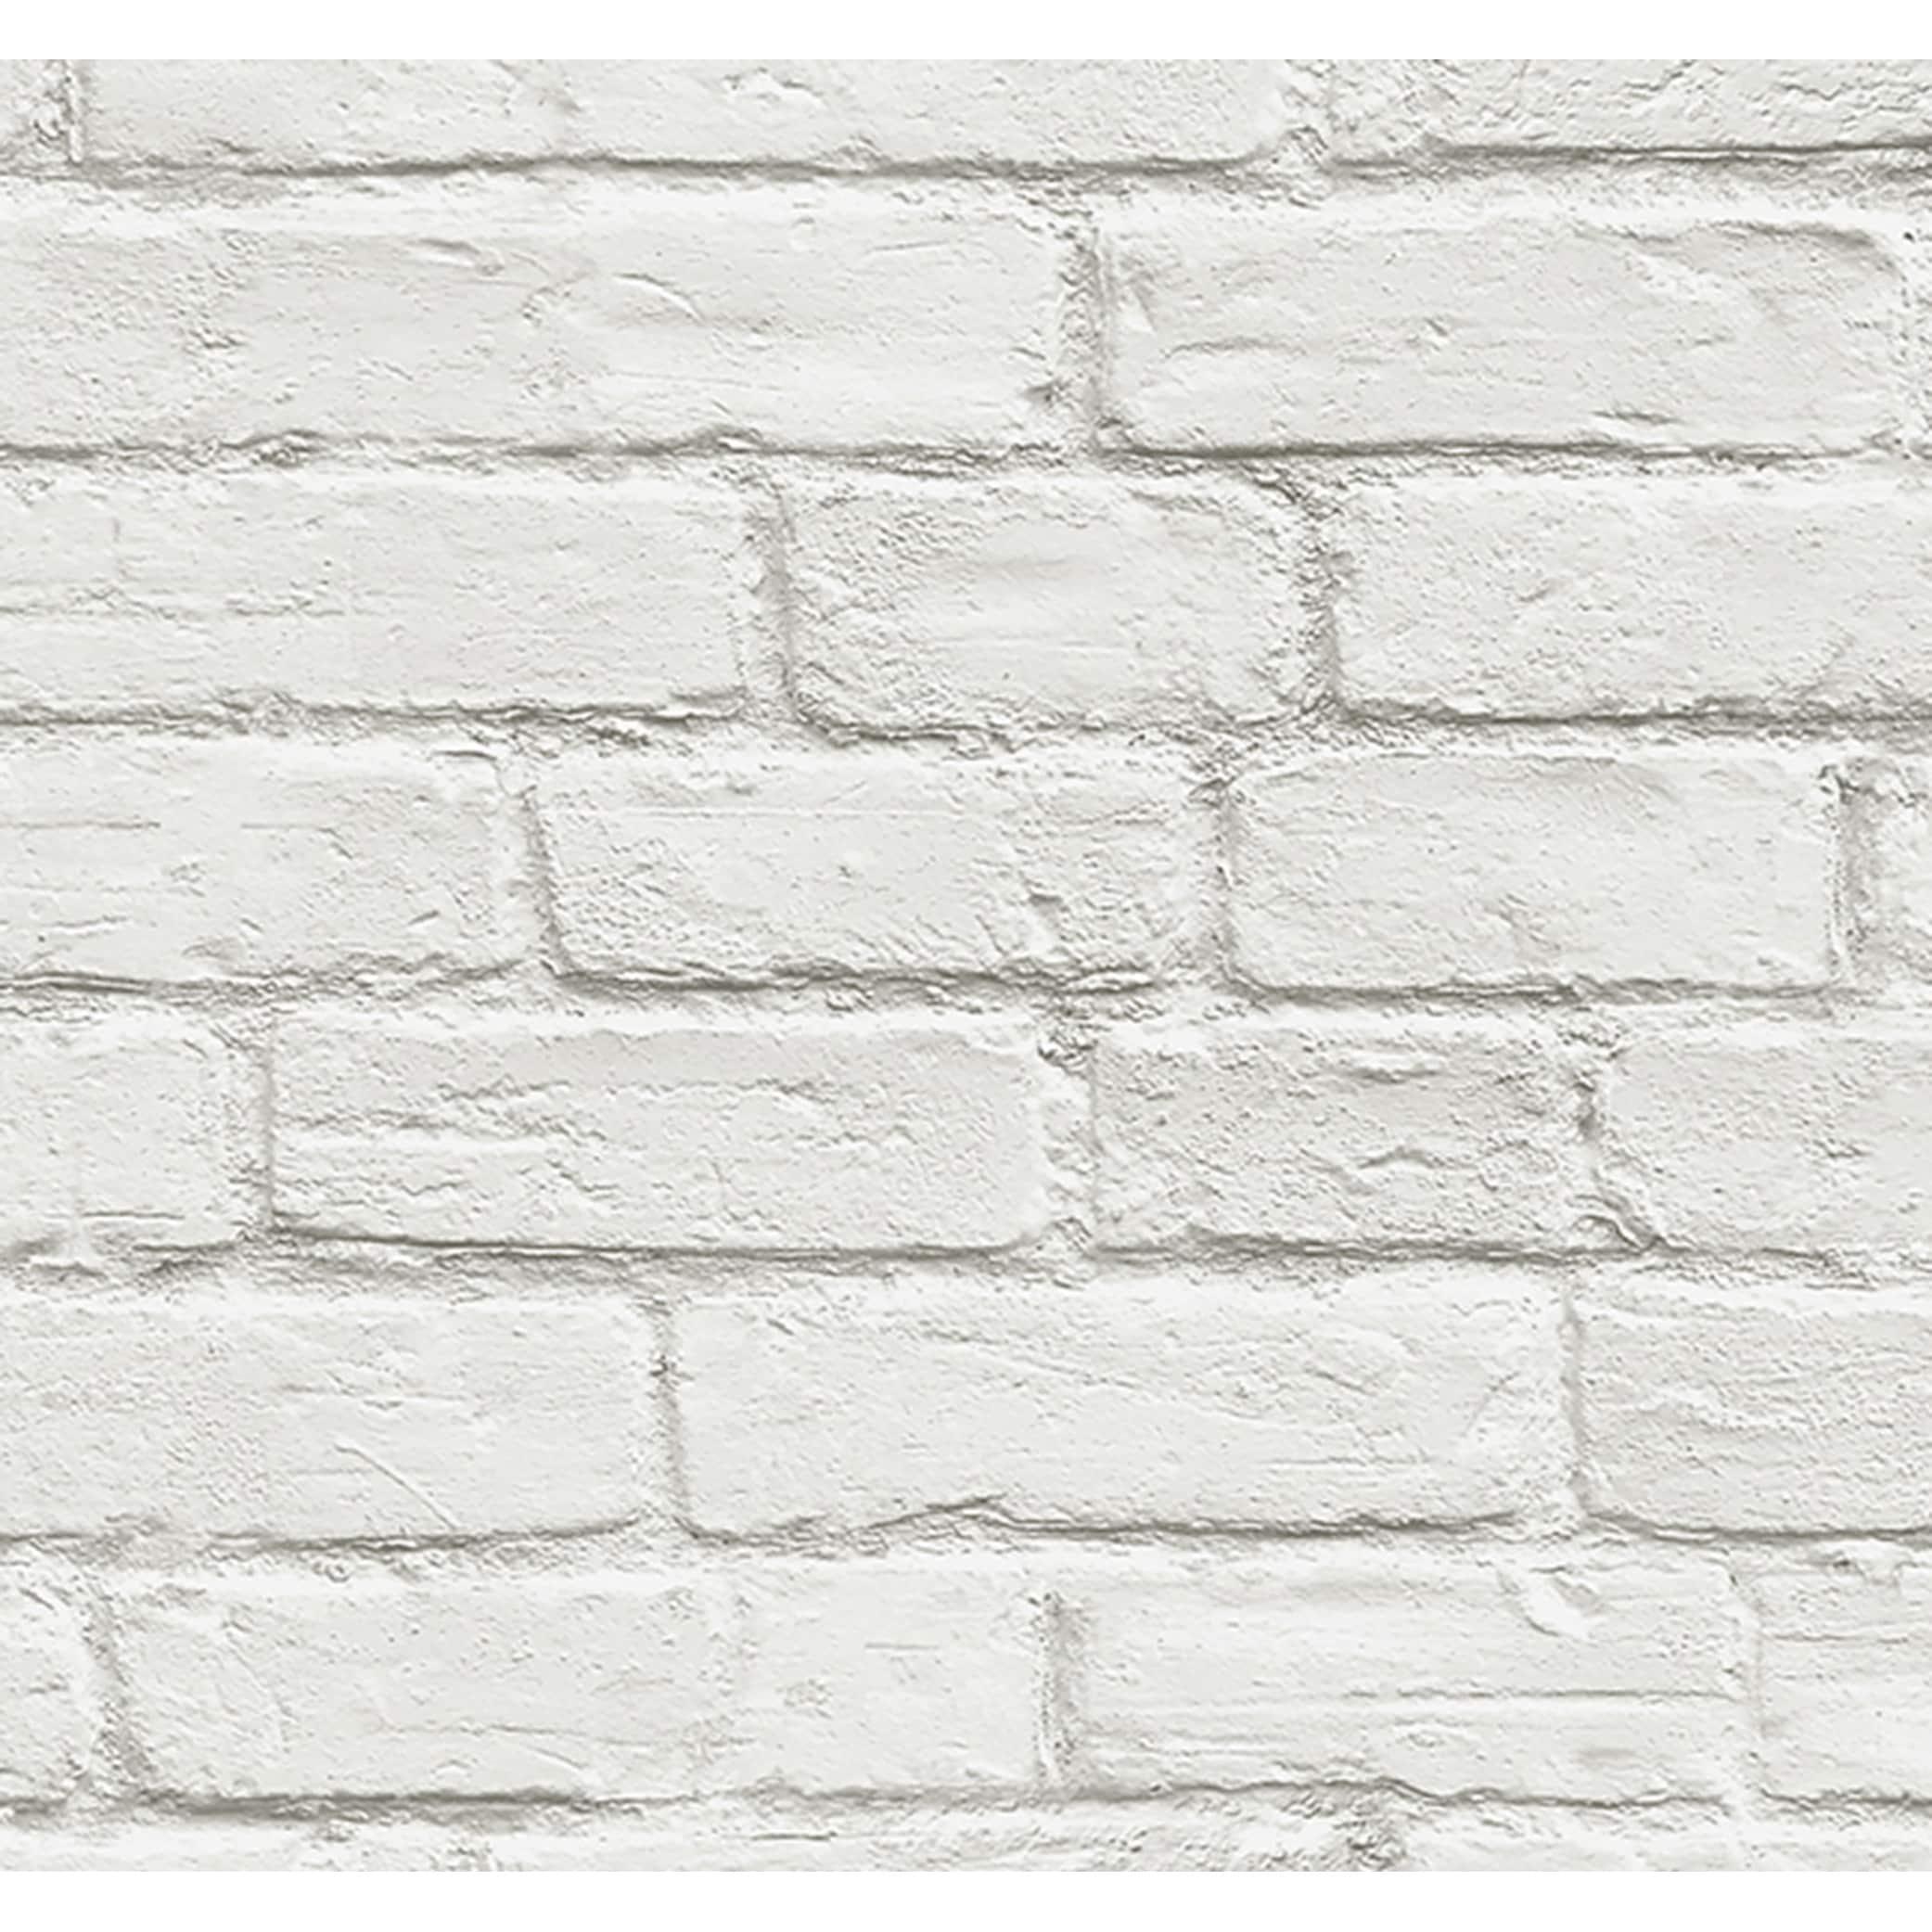 Transform White Brick Peel and Stick Wallpaper 7bc5e798 b242 44c6 b35c f3489fbbdb2d